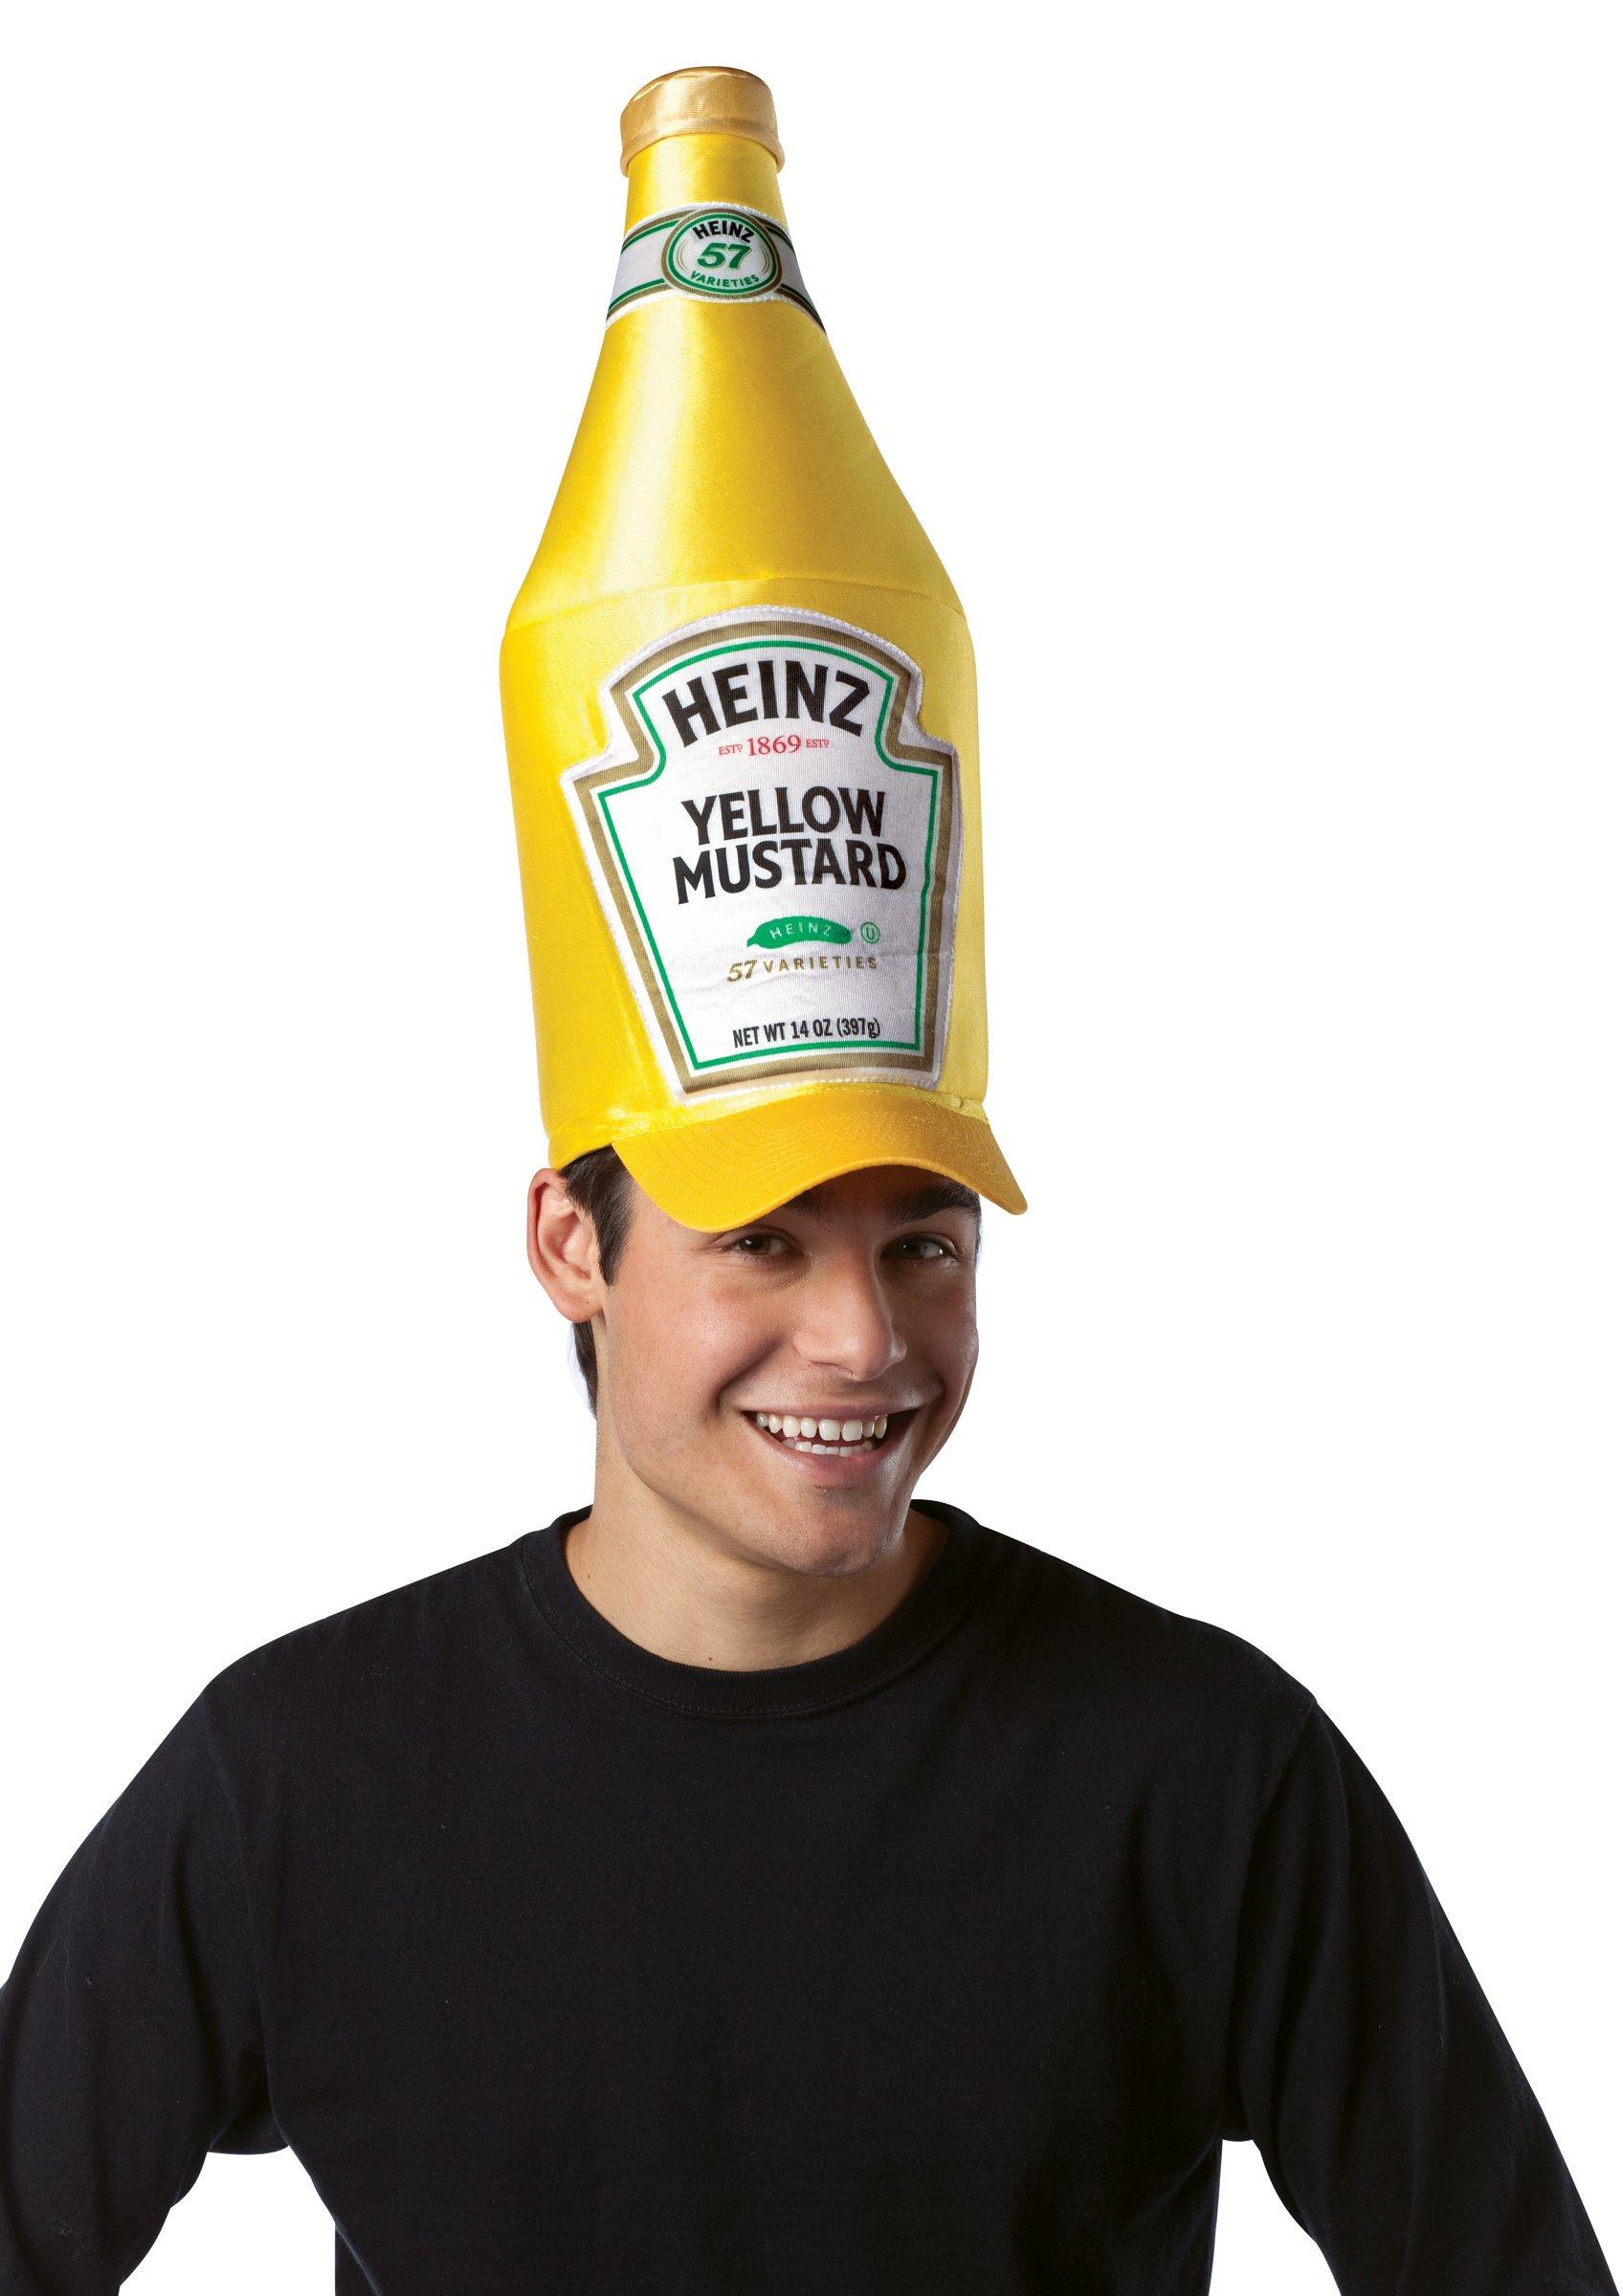 648ab2615c4 Heinz Classic Mustard Bottle Hat (Adult)  Costume Hats